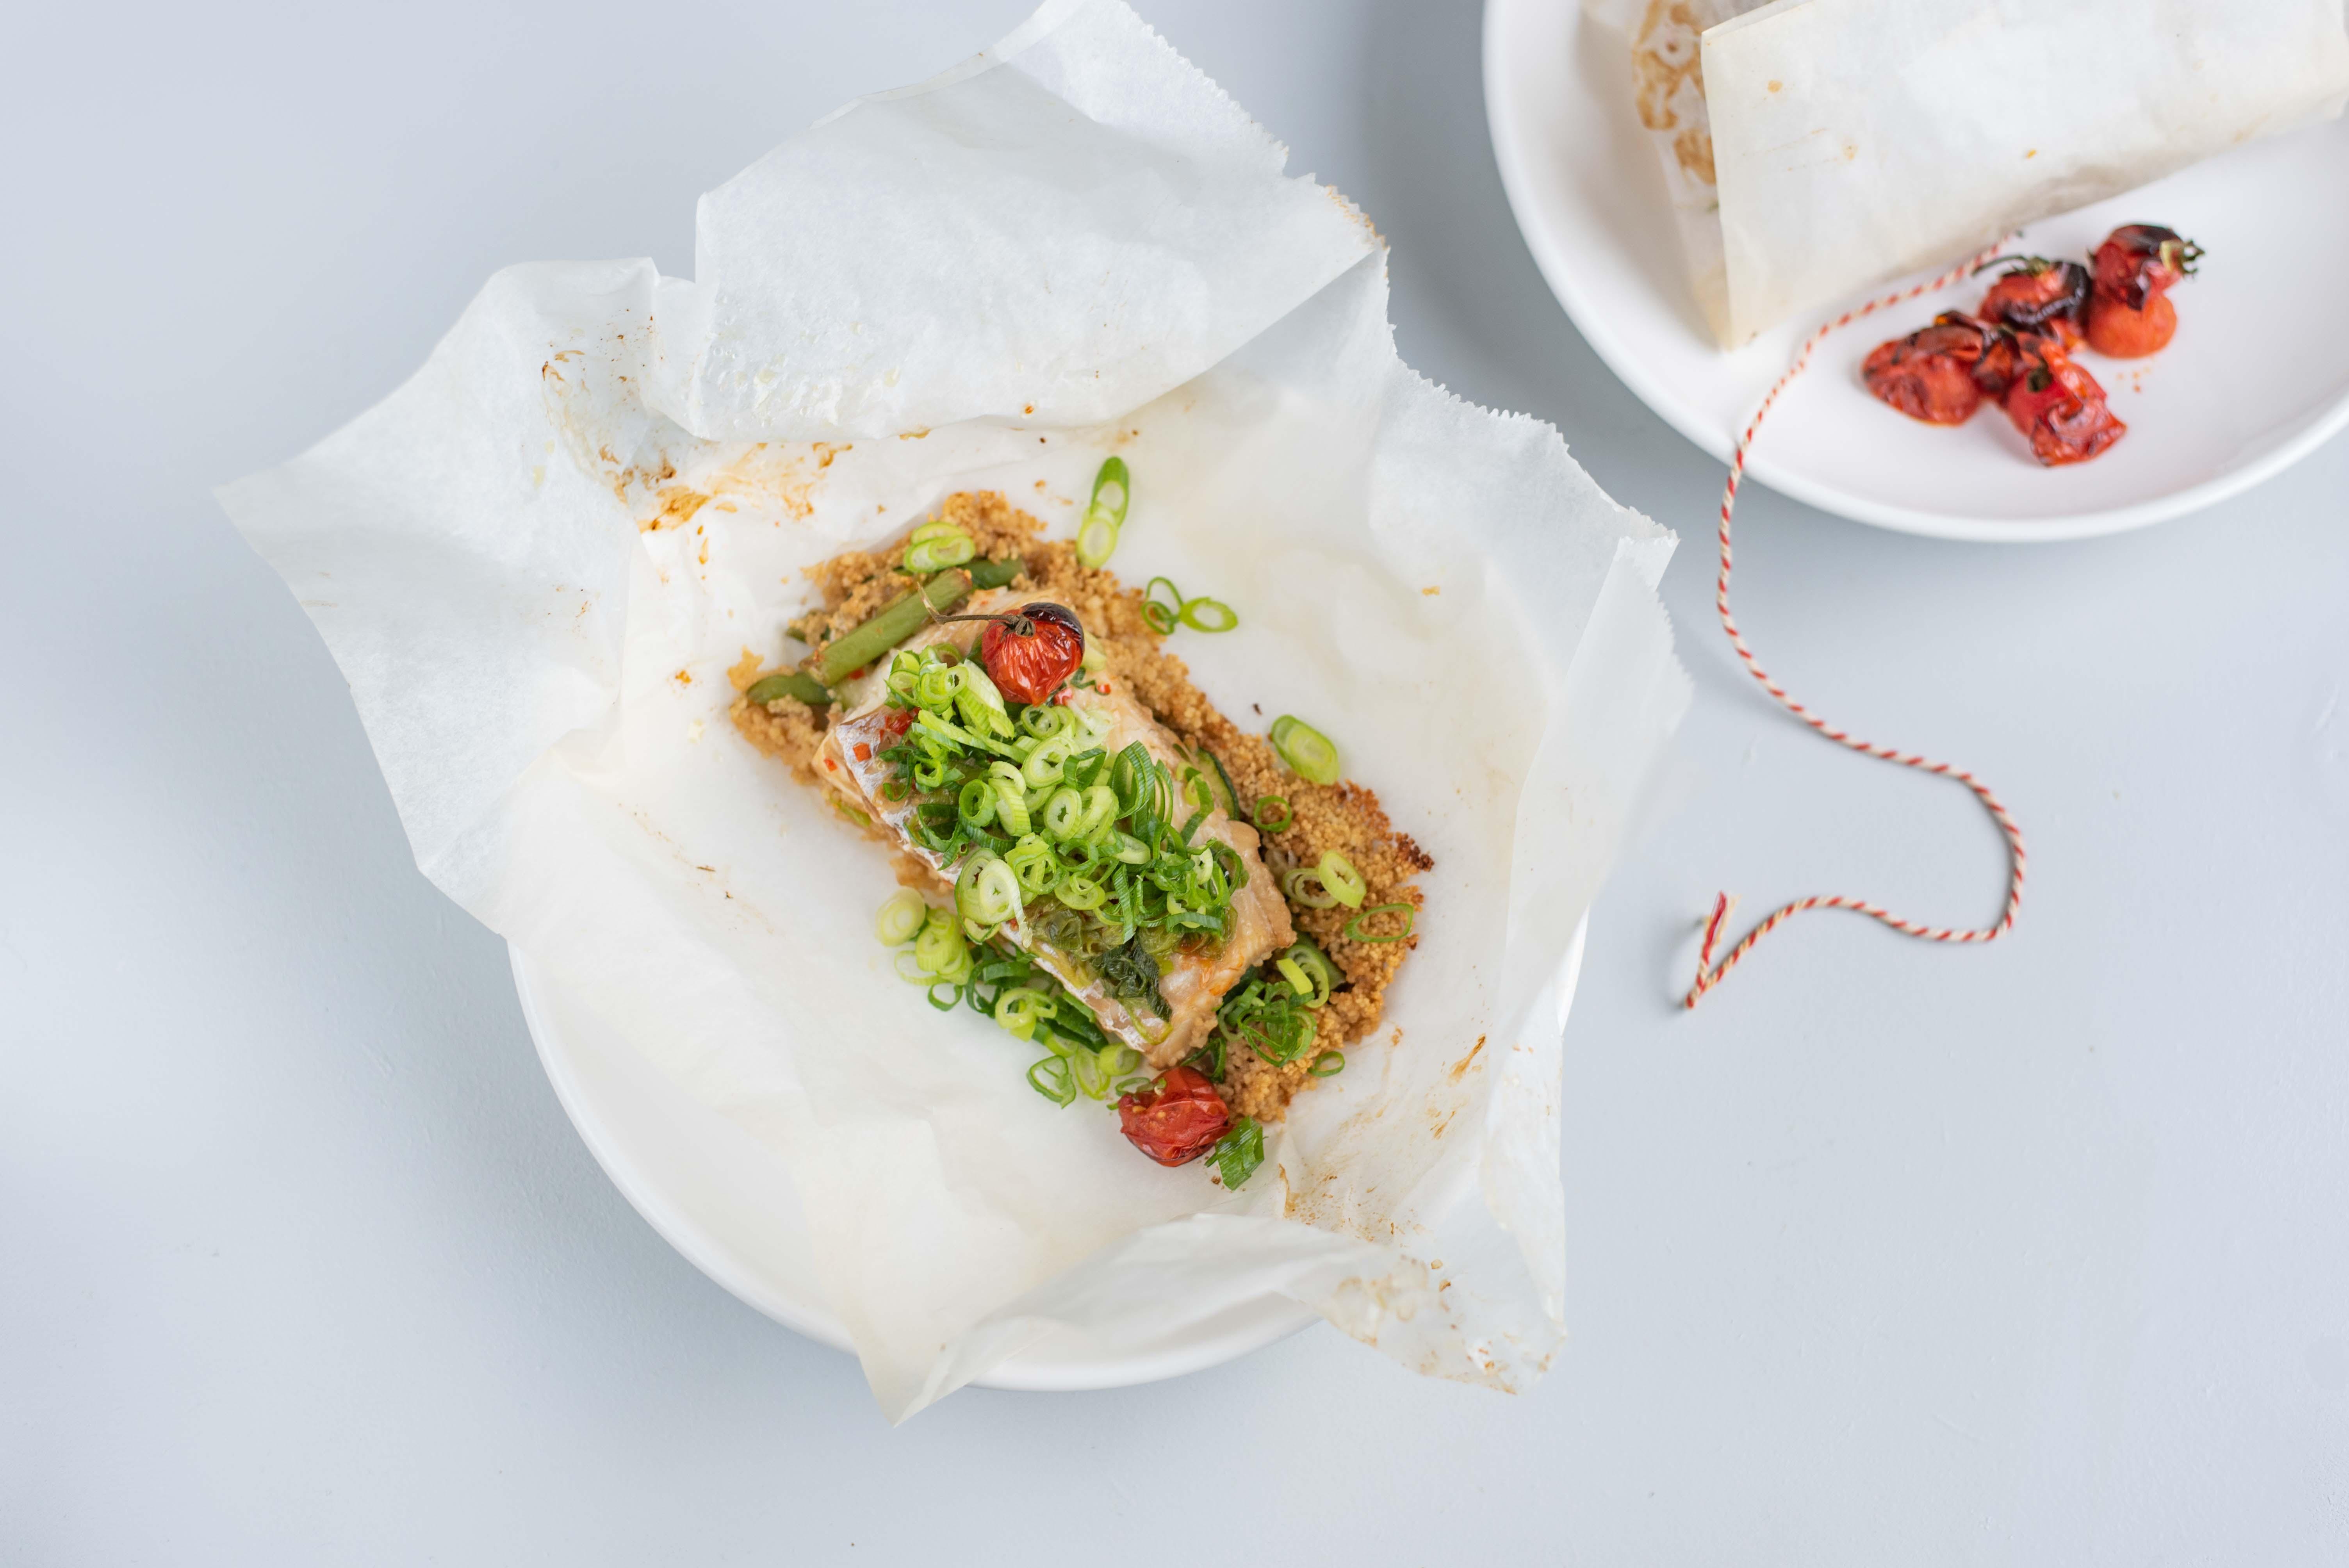 Oosters vispakketje met couscous